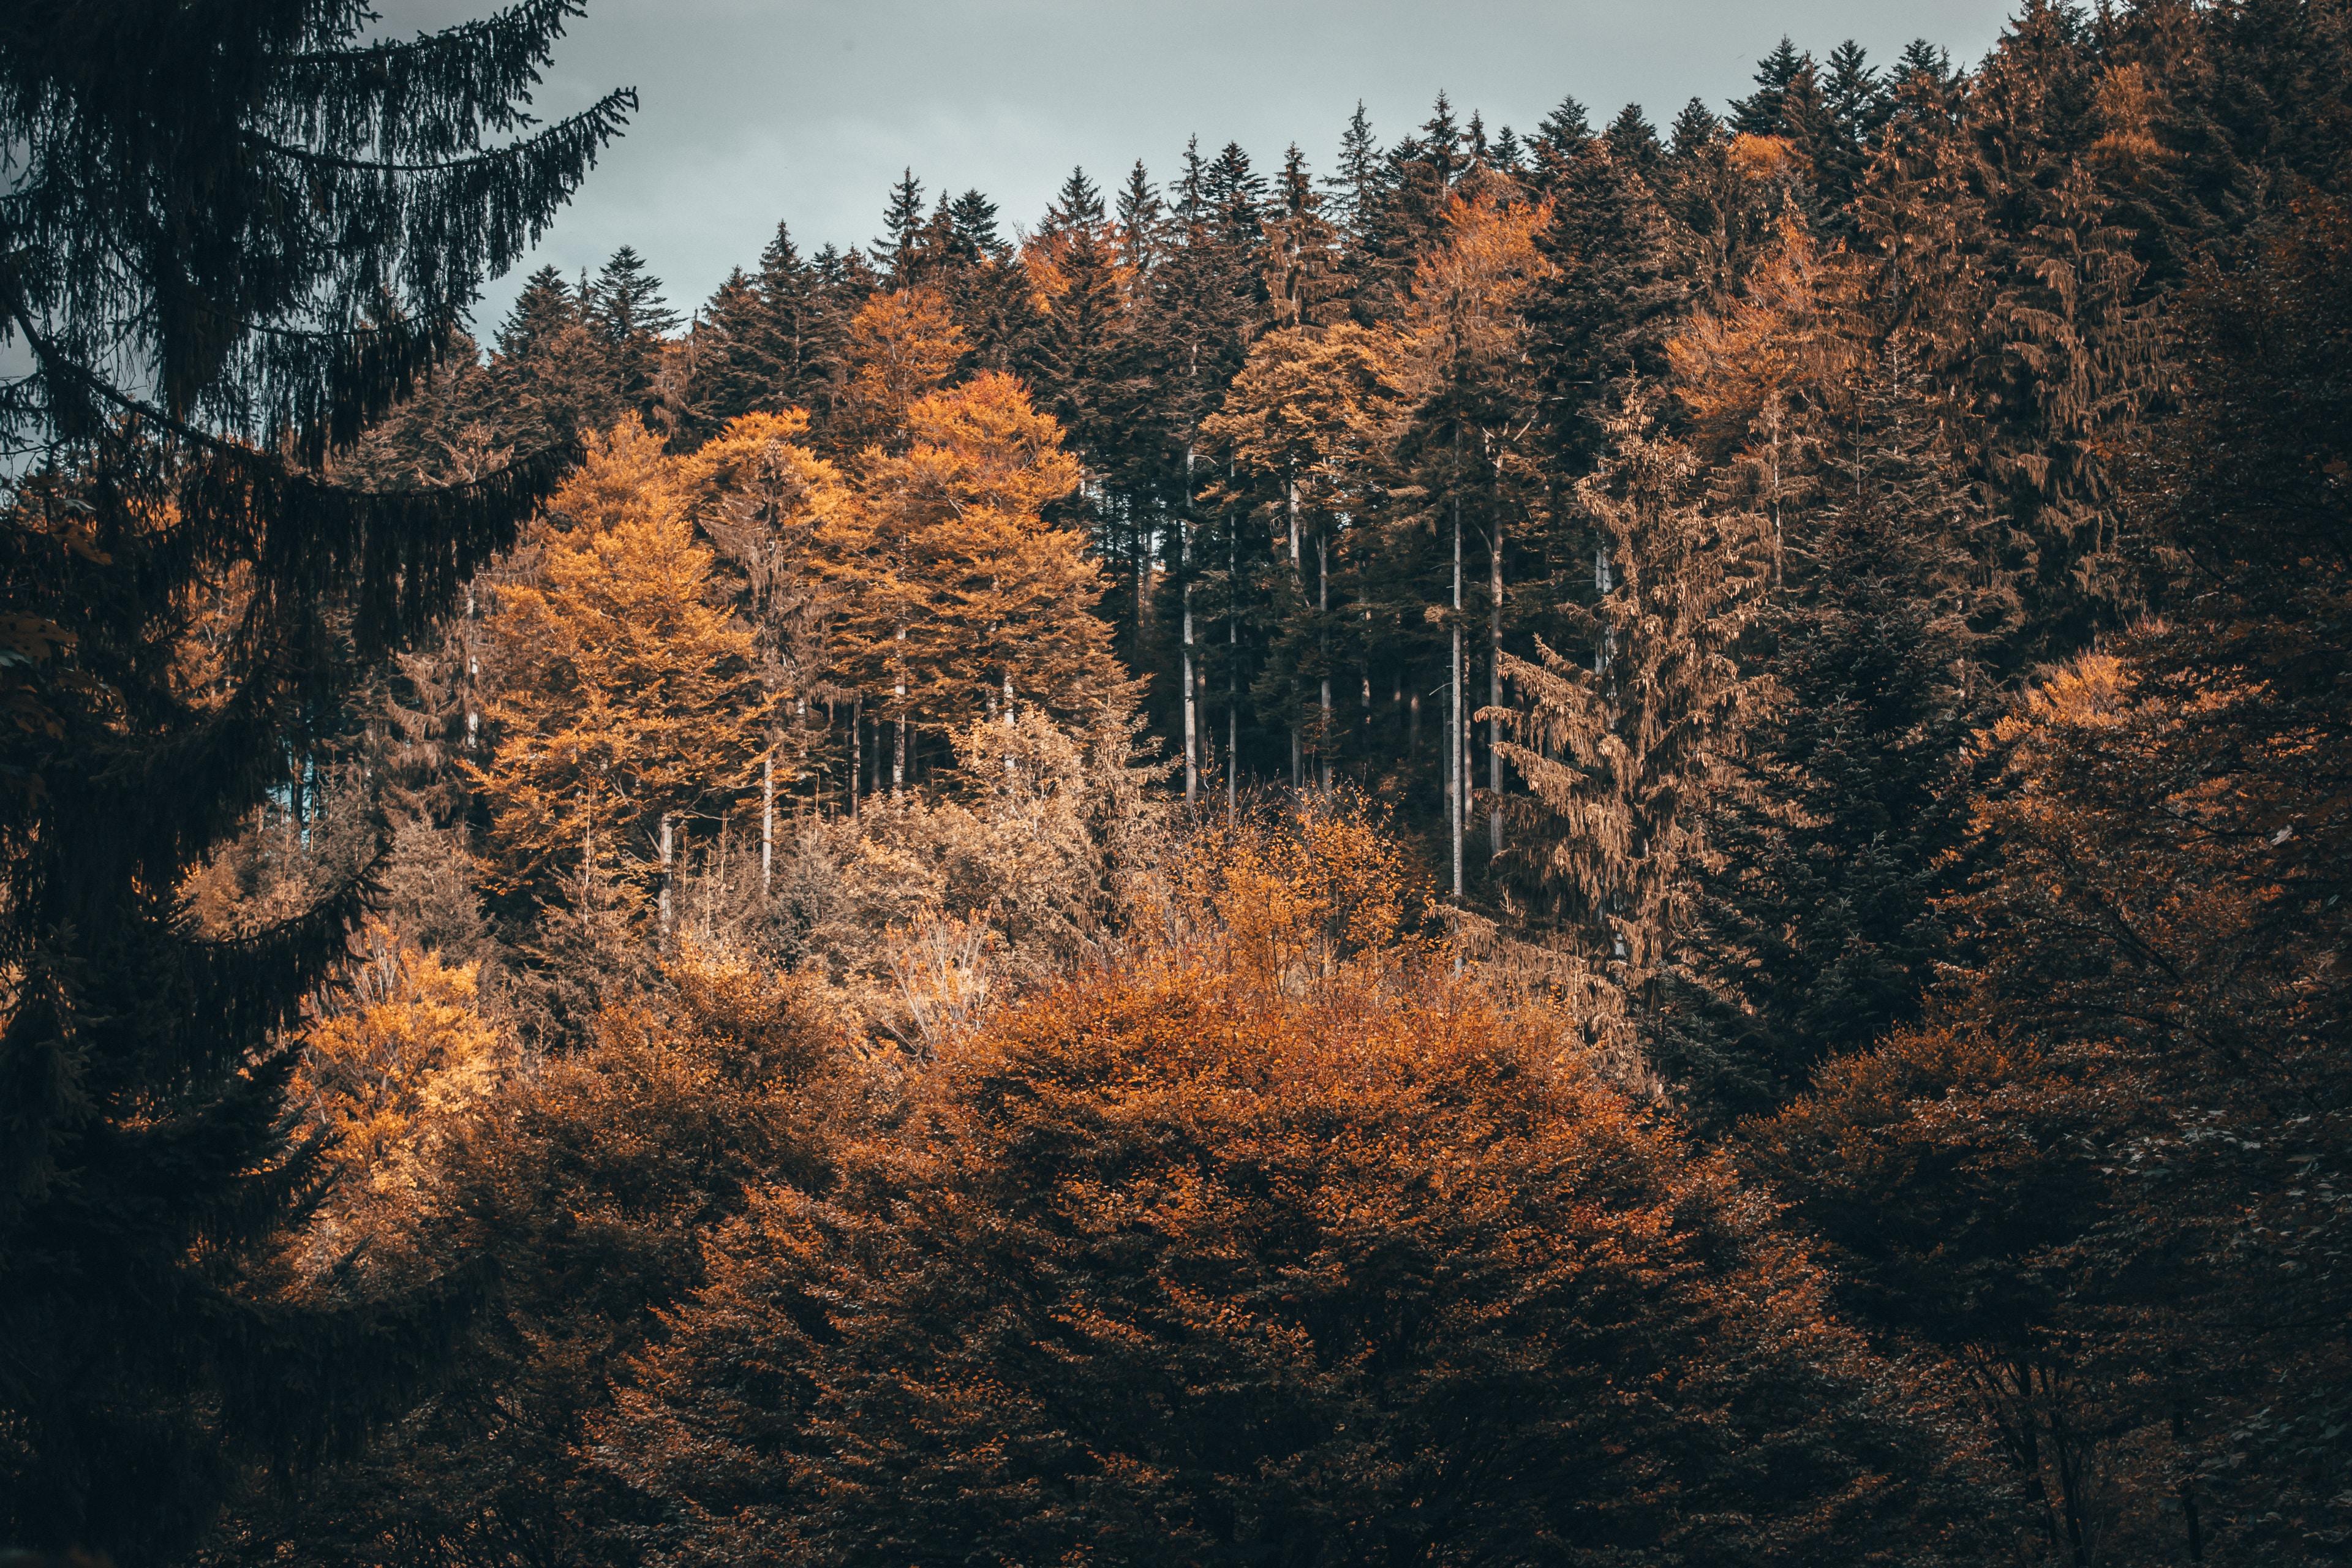 landscape photograph of forest